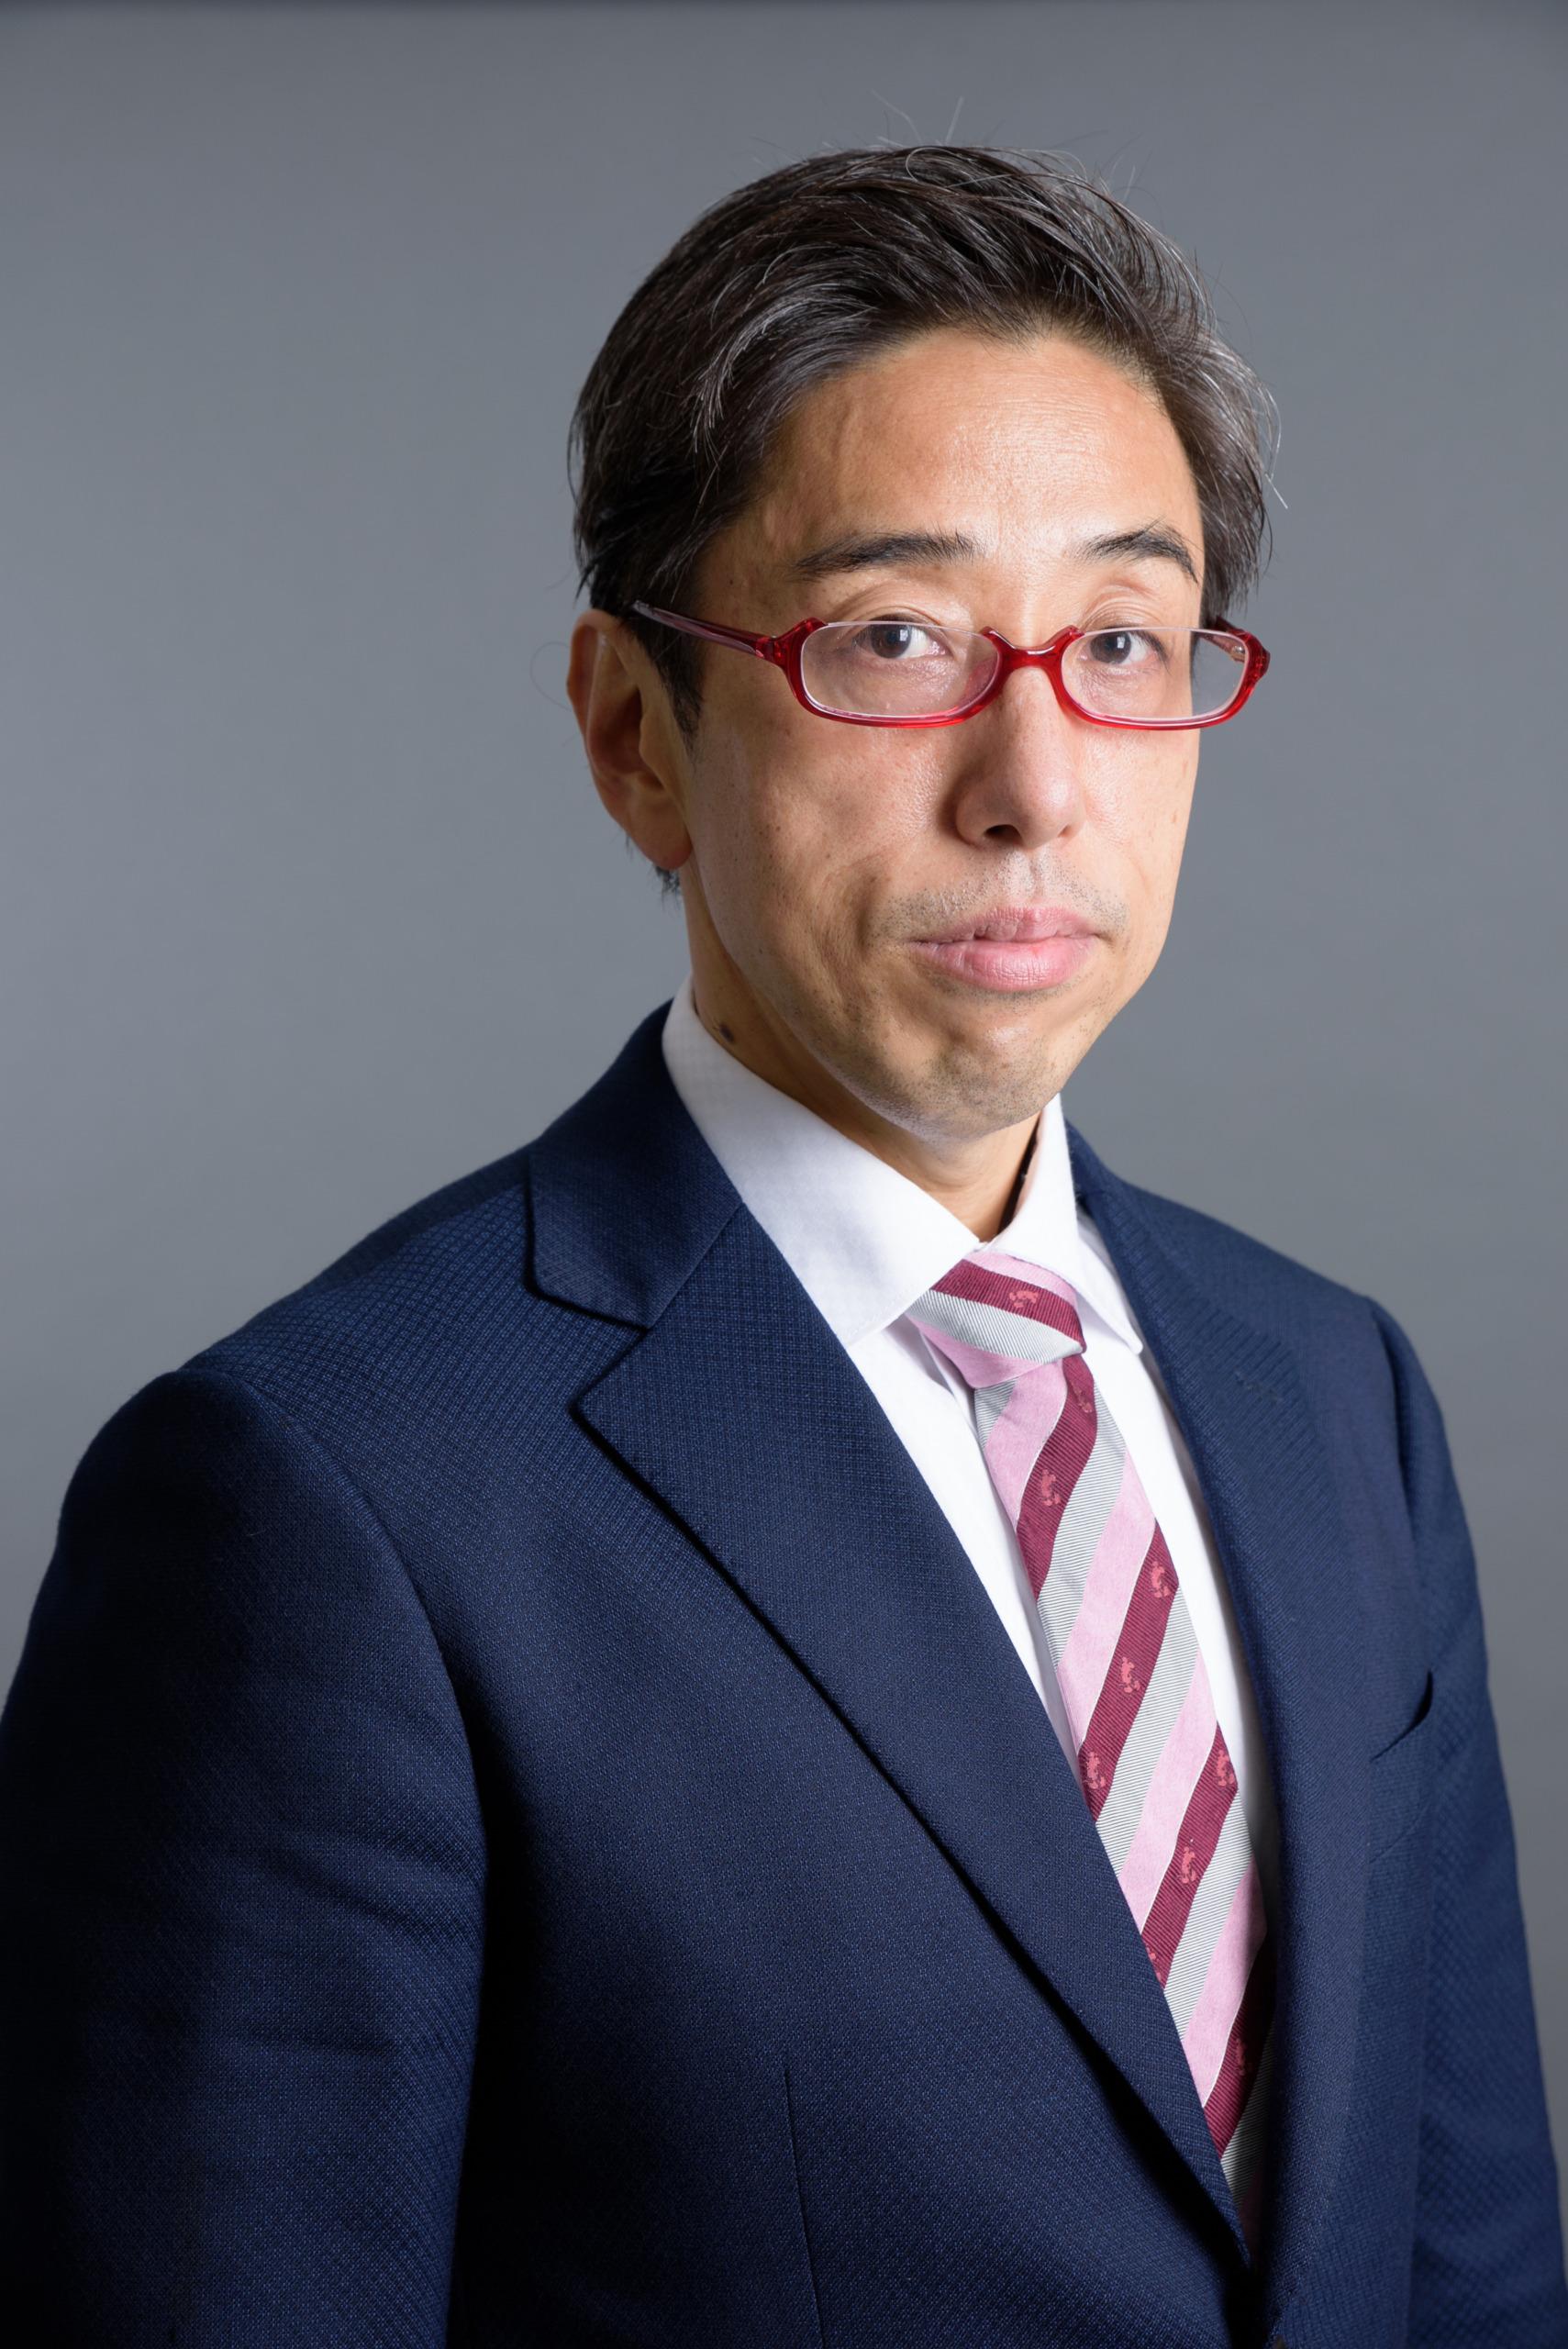 株式会社クリアソシエ代表取締役社長北村有岐